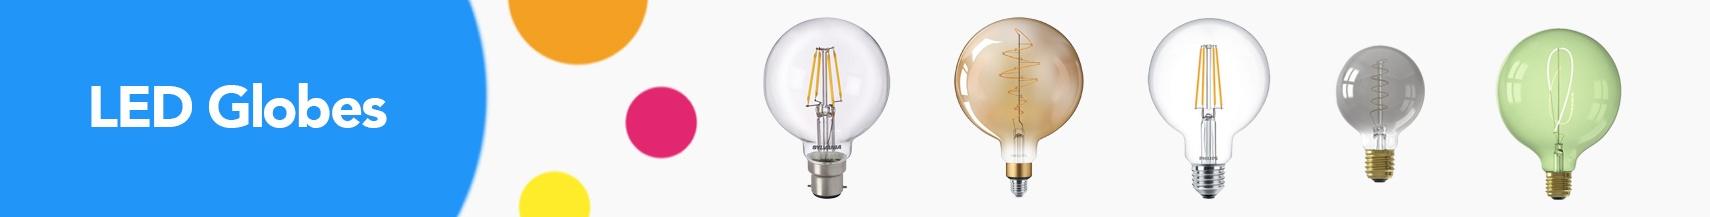 LED_Globes_1